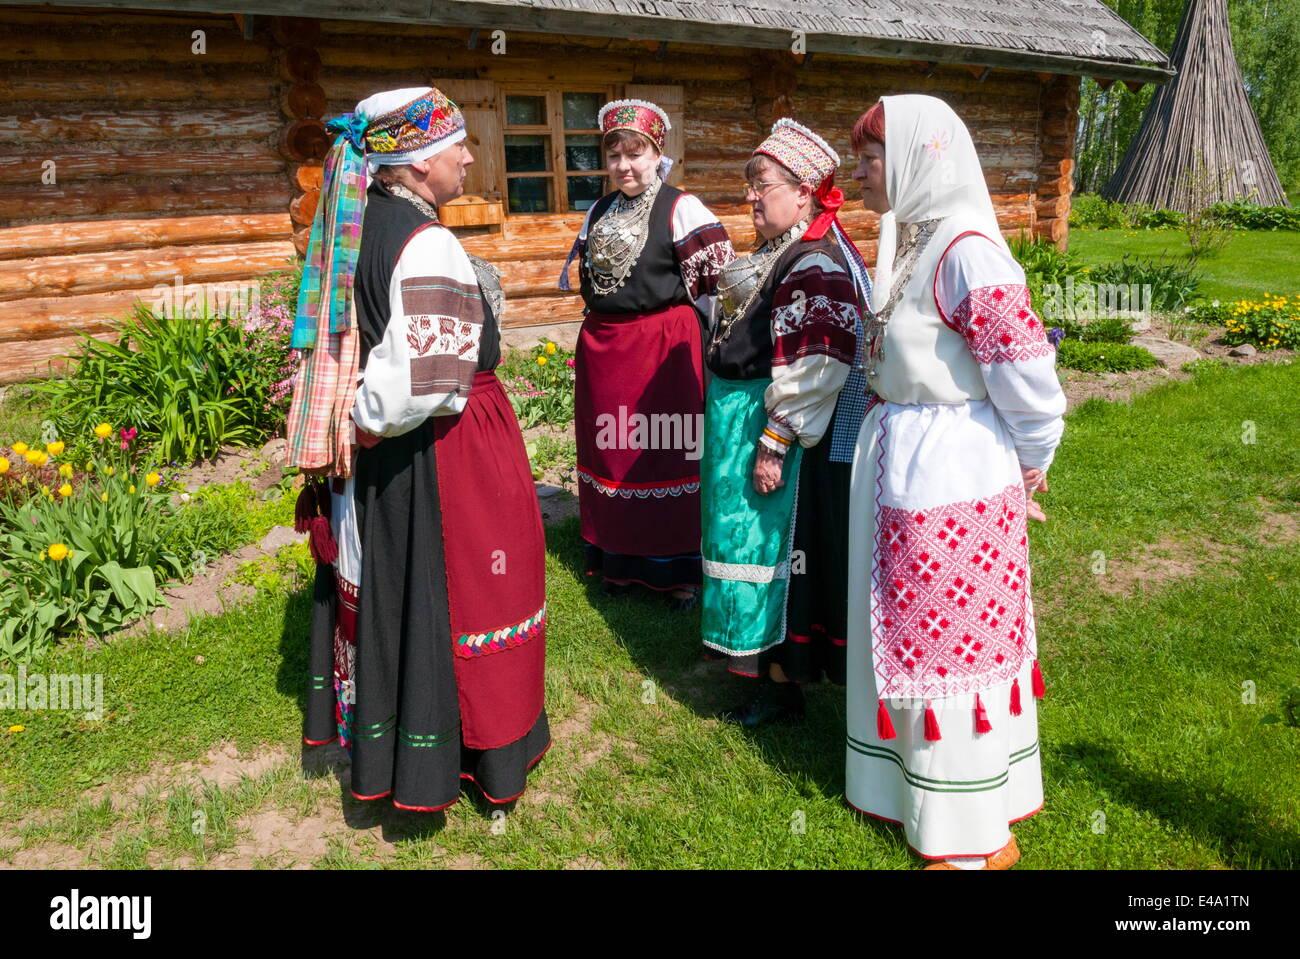 Seto women in traditional costume, Seto Farm Museum, Varska, Estonia, Baltic States, Europe - Stock Image